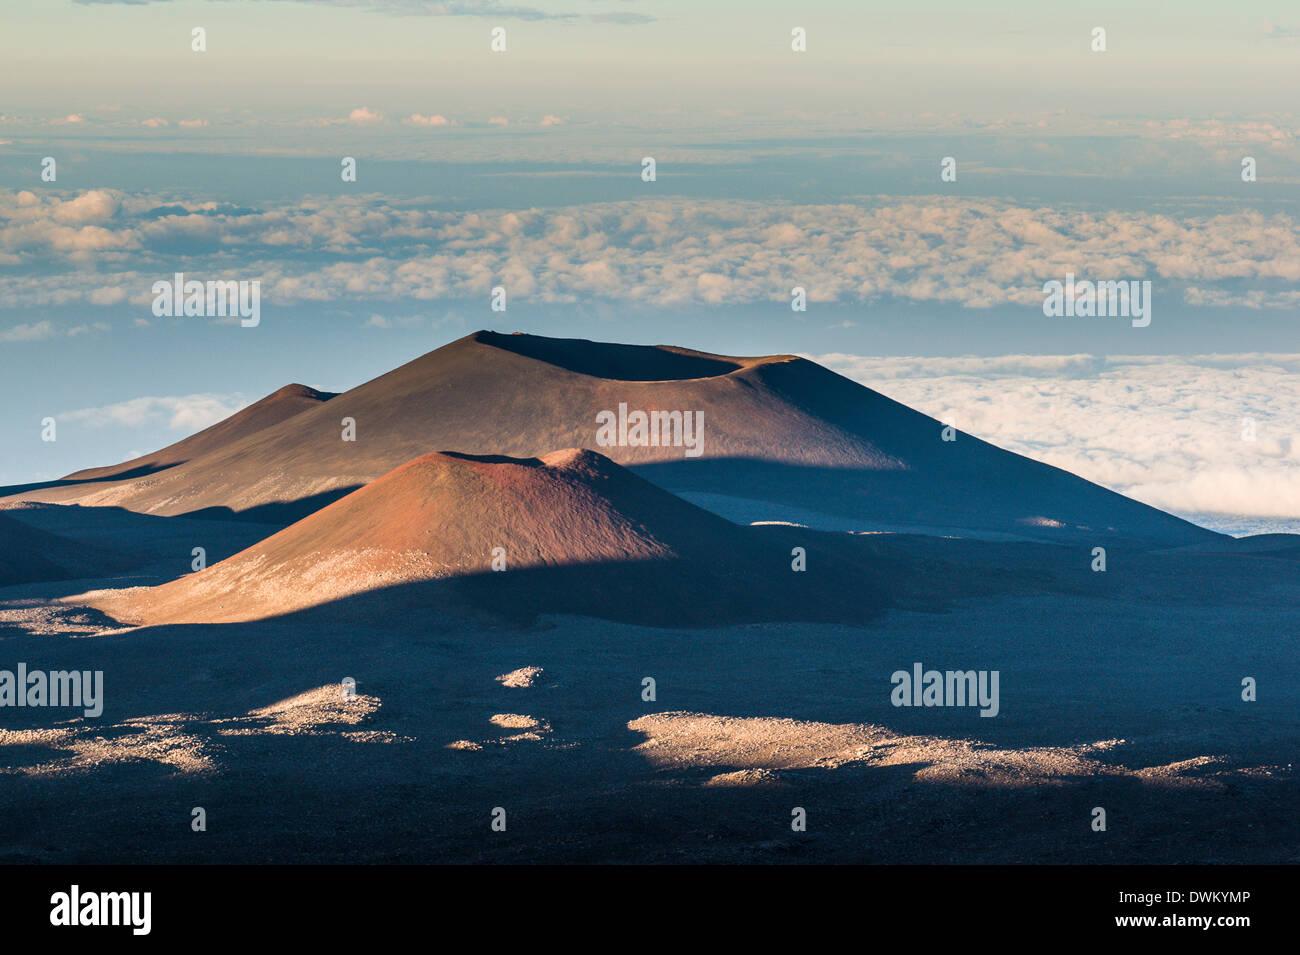 Volcanic cones on top of Mauna Kea, Big Island, Hawaii, United States of America, Pacific - Stock Image